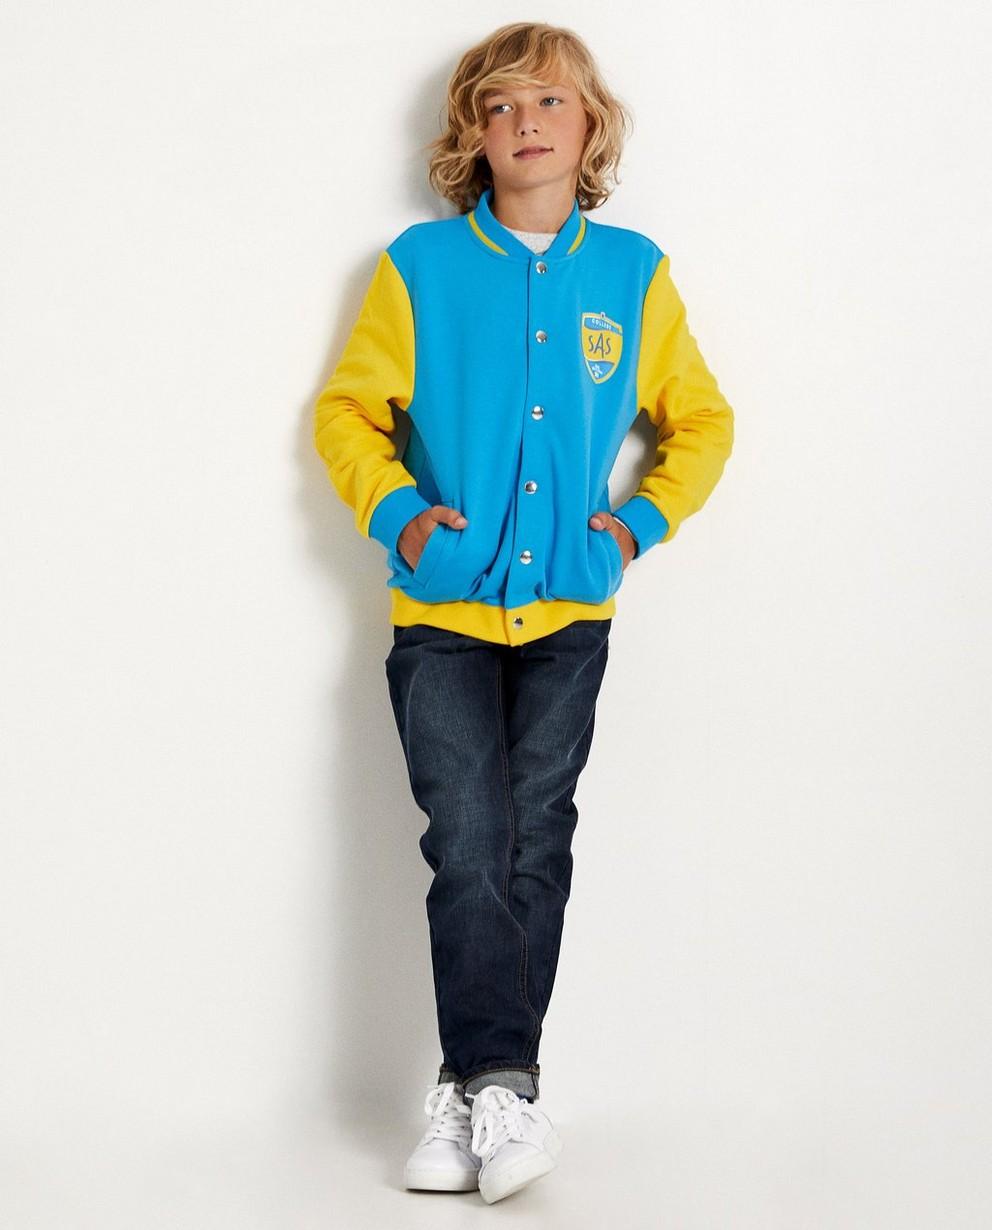 Gilet bleu et jaune #LikeMe - bomber - Like Me